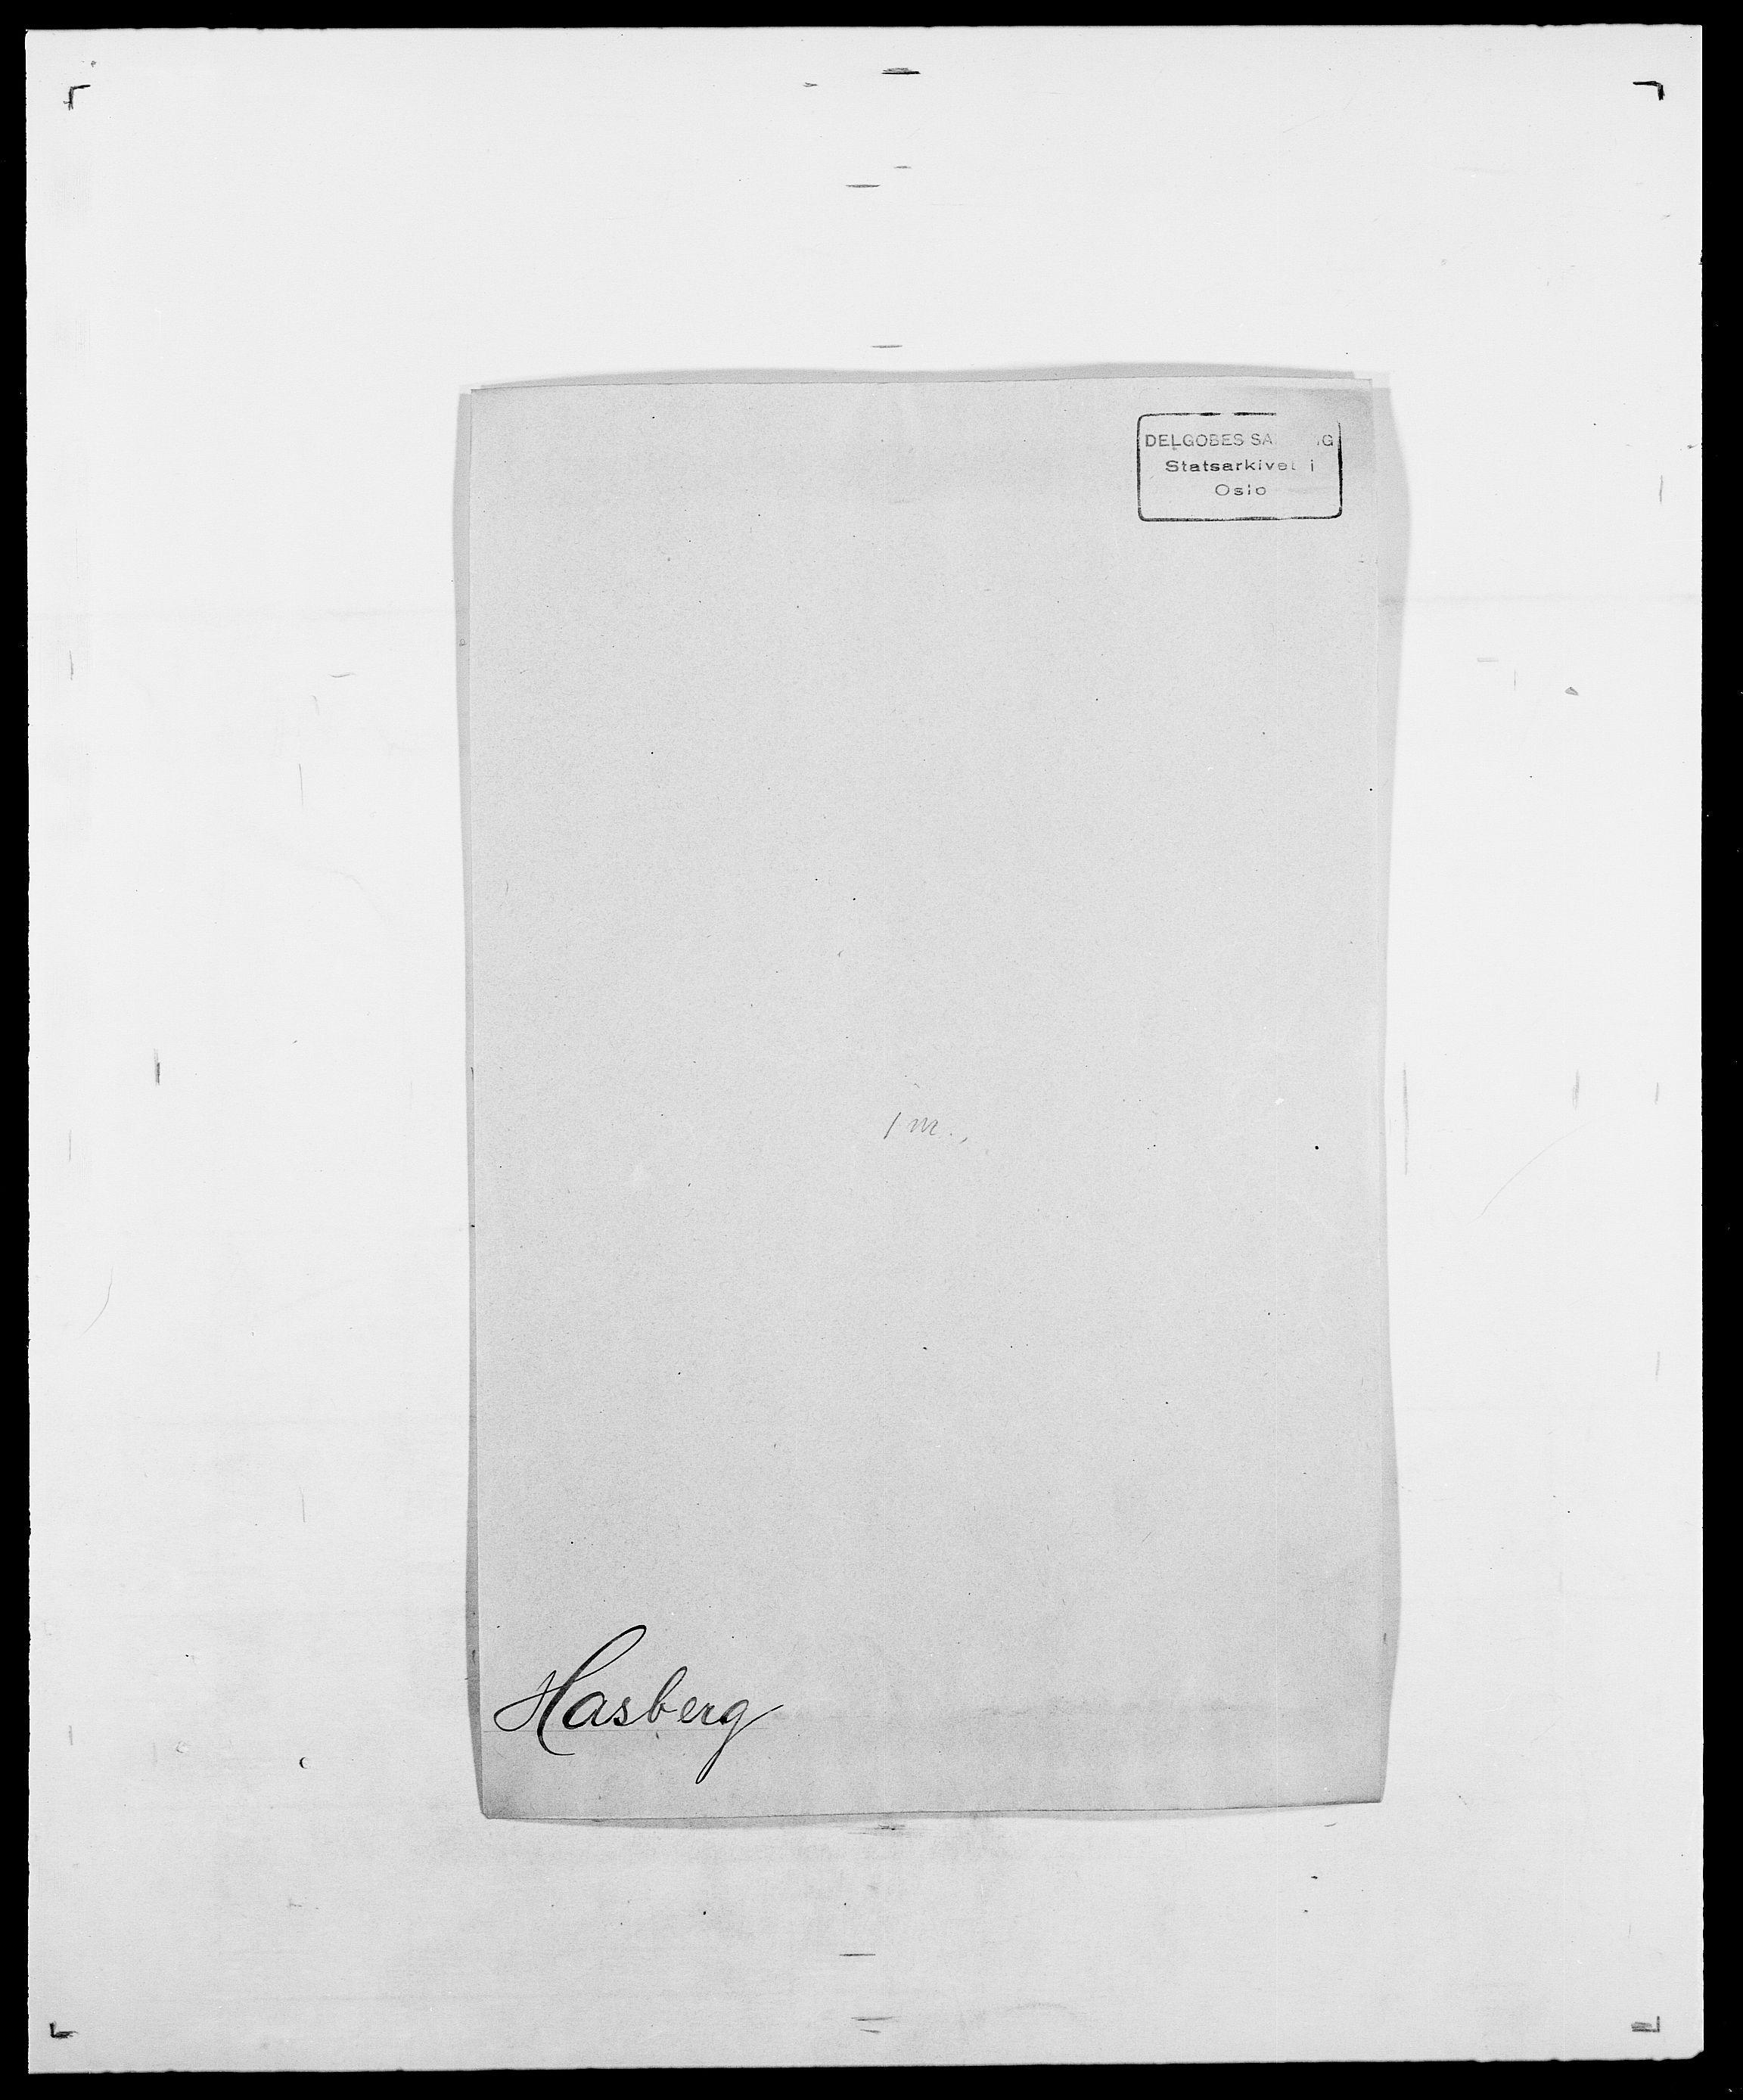 SAO, Delgobe, Charles Antoine - samling, D/Da/L0016: Hamborg - Hektoen, s. 472